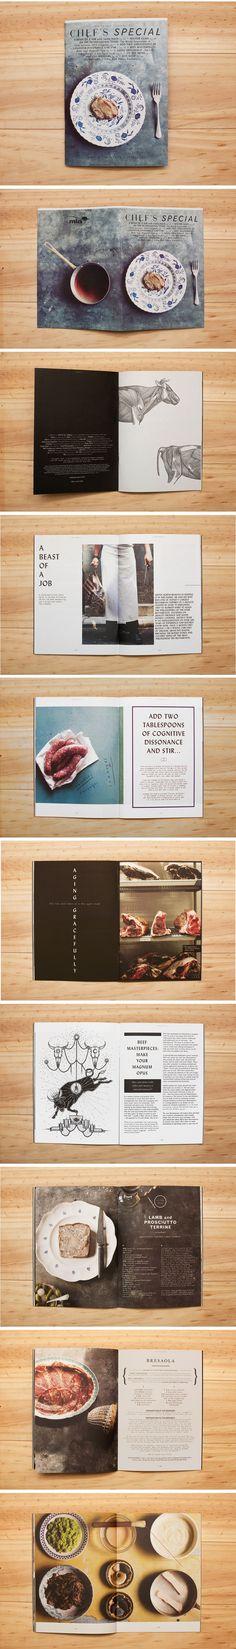 Magazine design inspiration. Just beautiful.